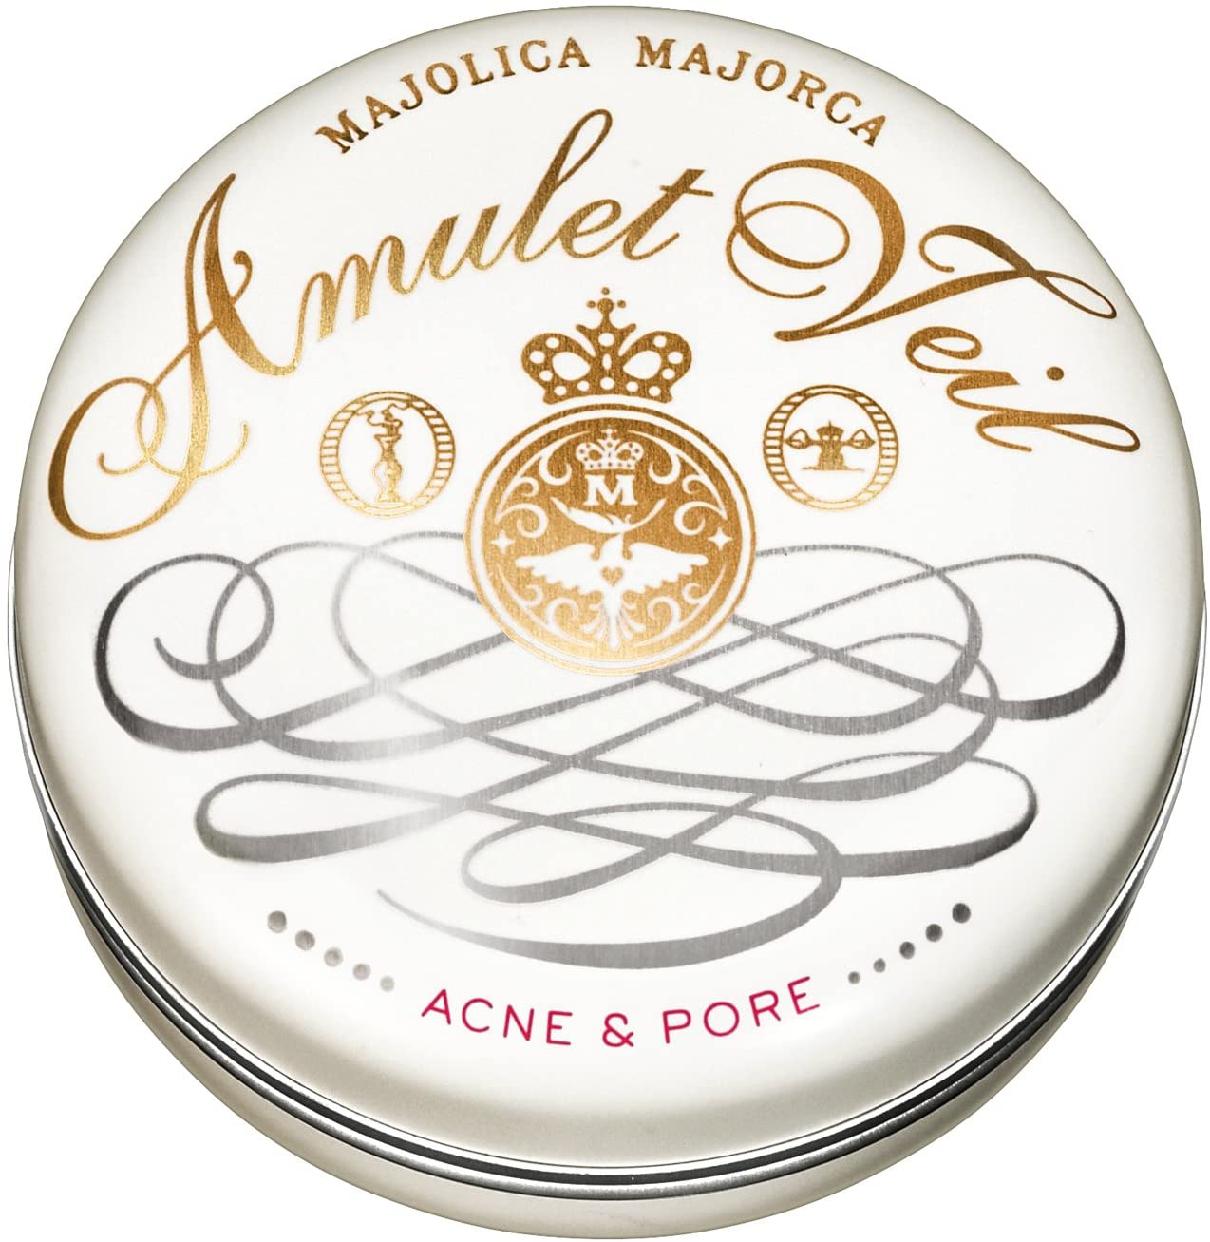 MAJOLICA MAJORCA(マジョリカ マジョルカ) アミュレットヴェールの商品画像5